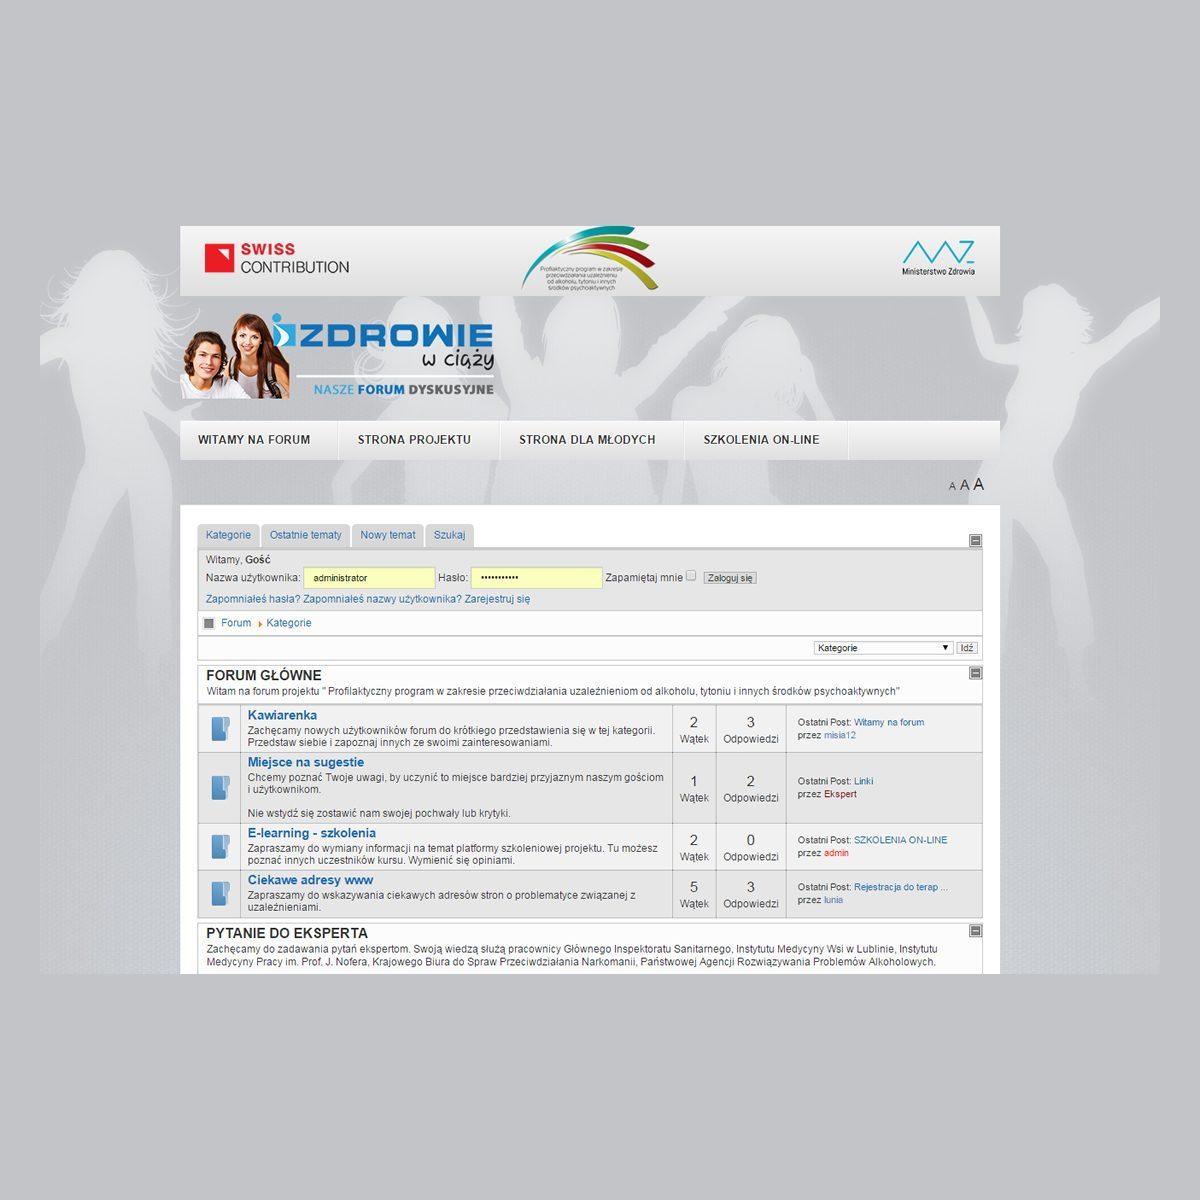 stronka_forum-3819749-9287364